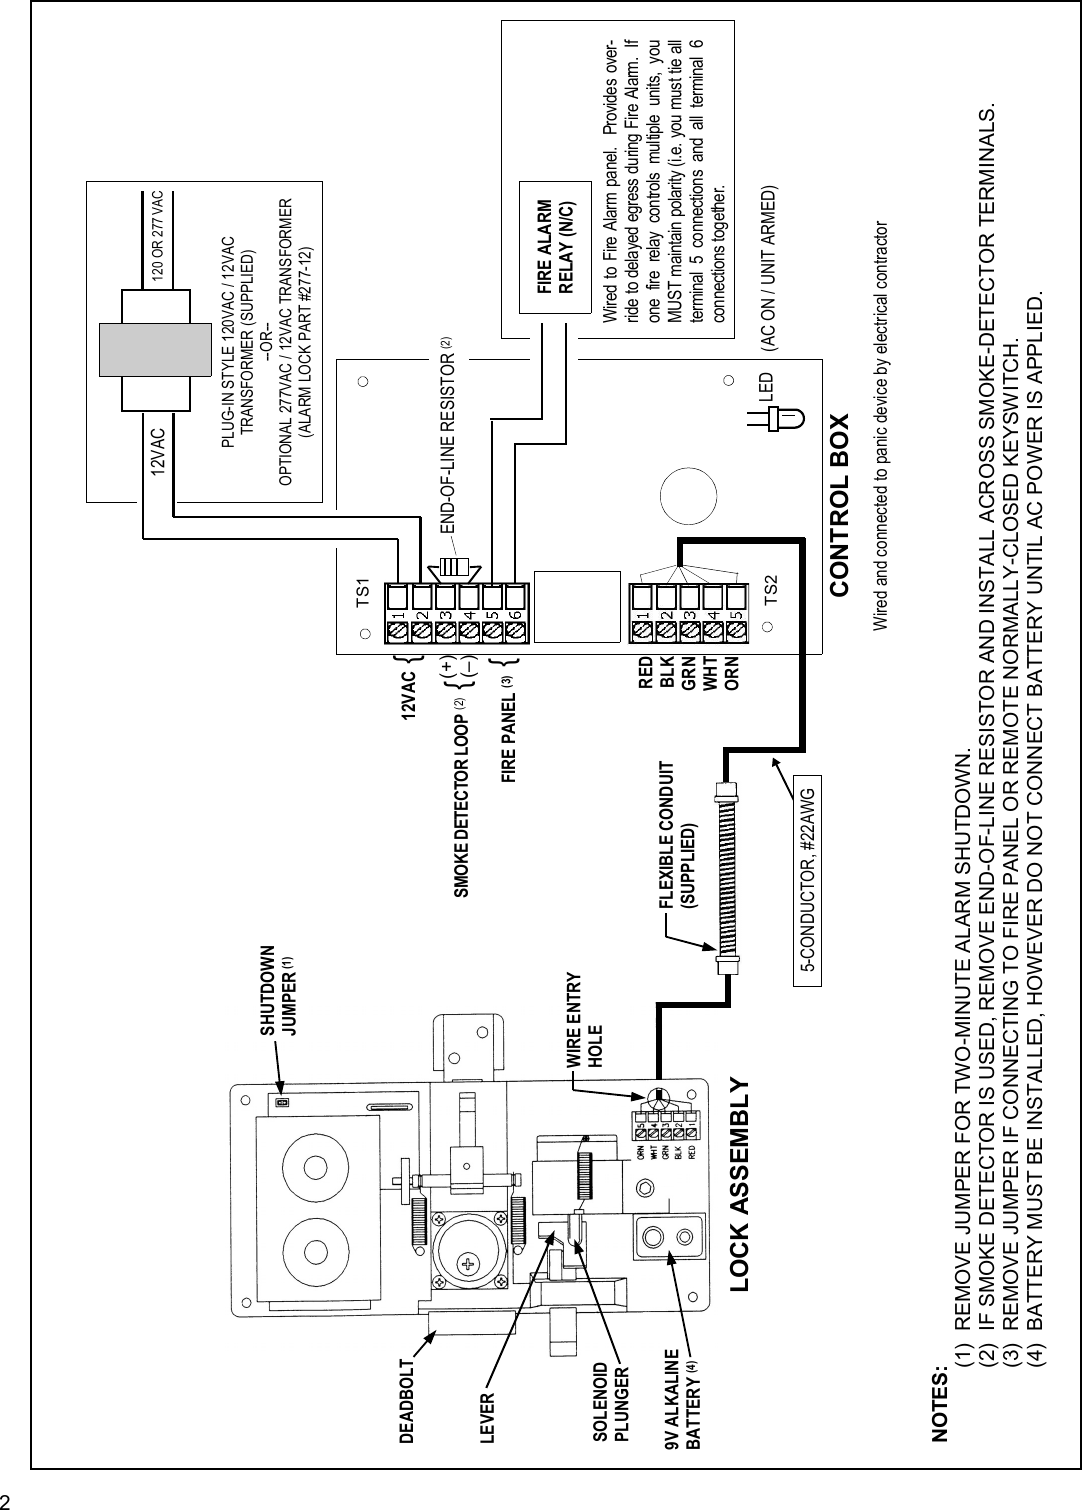 Locks 715_Gen_WI1584.18_QUICK General Wiring Instructions ... on